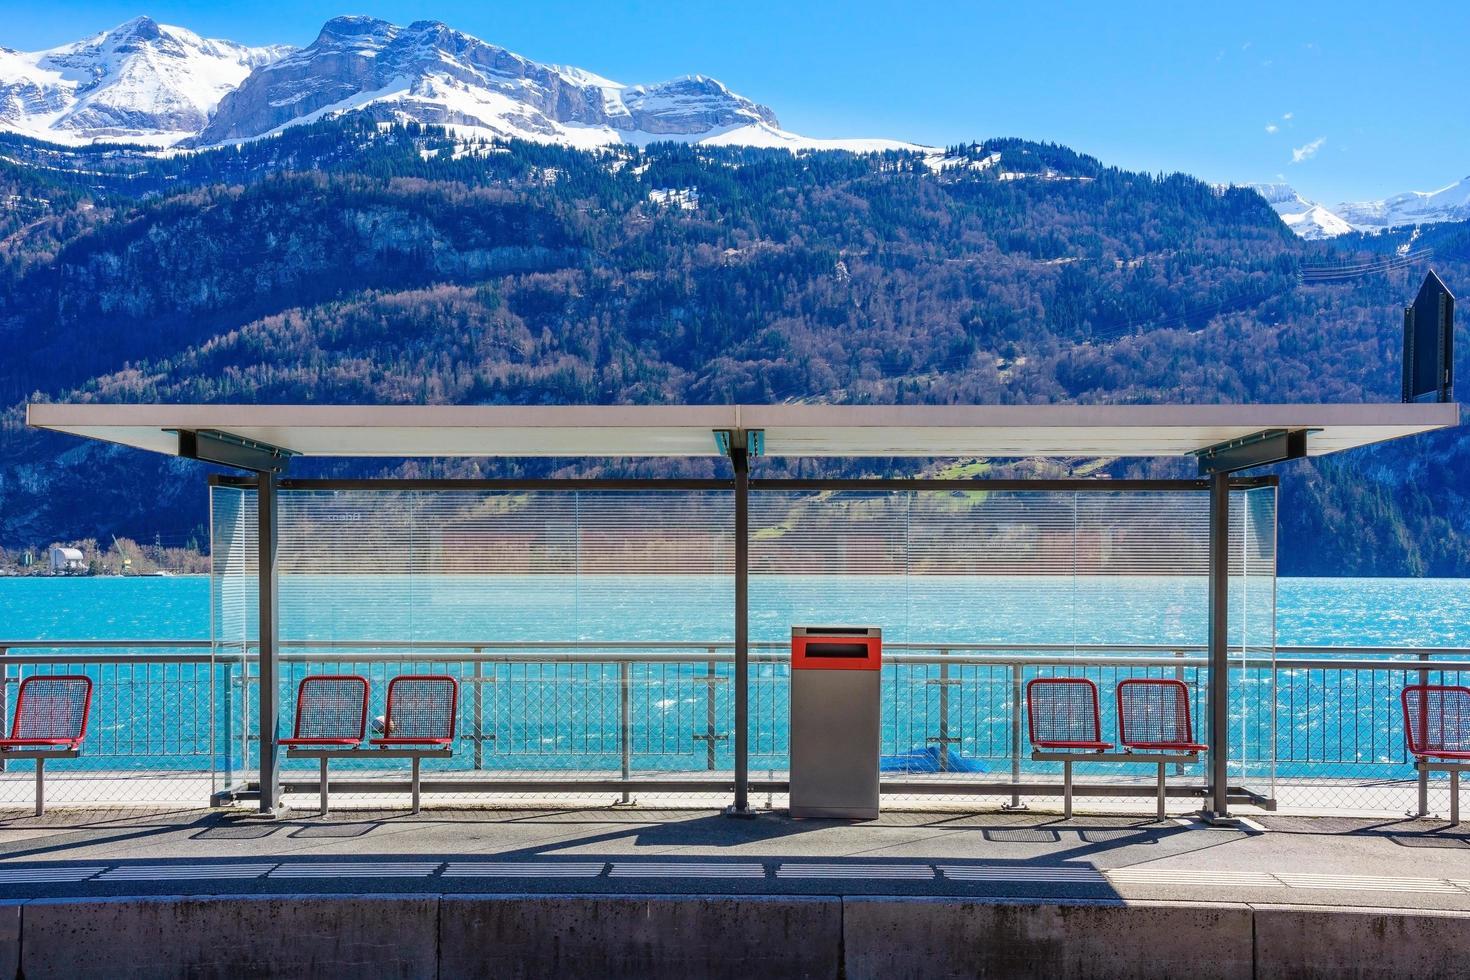 Brienz-station aan het Brienzermeer, Zwitserland foto